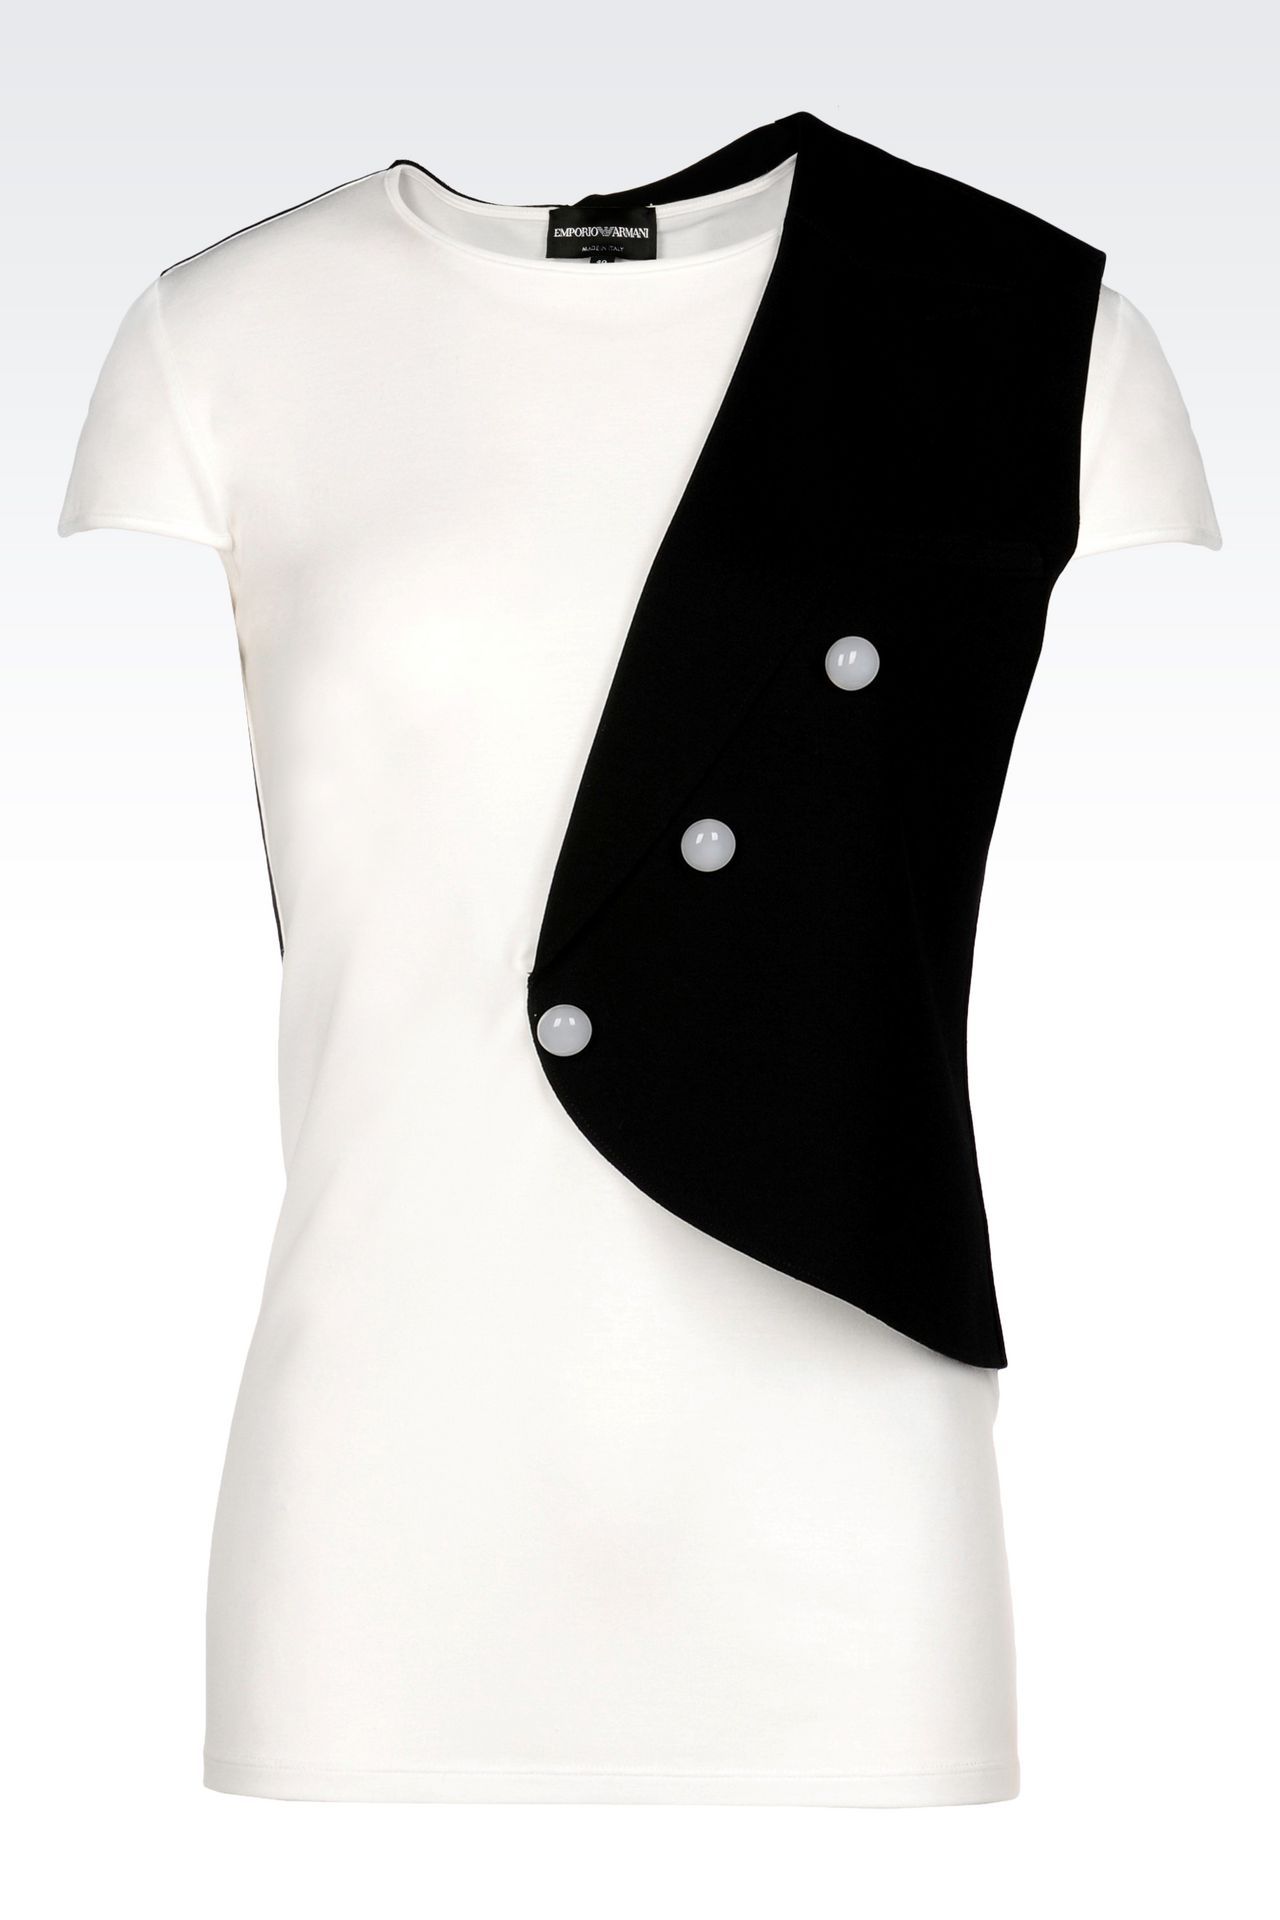 RUNWAY T-SHIRT IN JERSEY: Short-sleeve t-shirts Women by Armani - 0